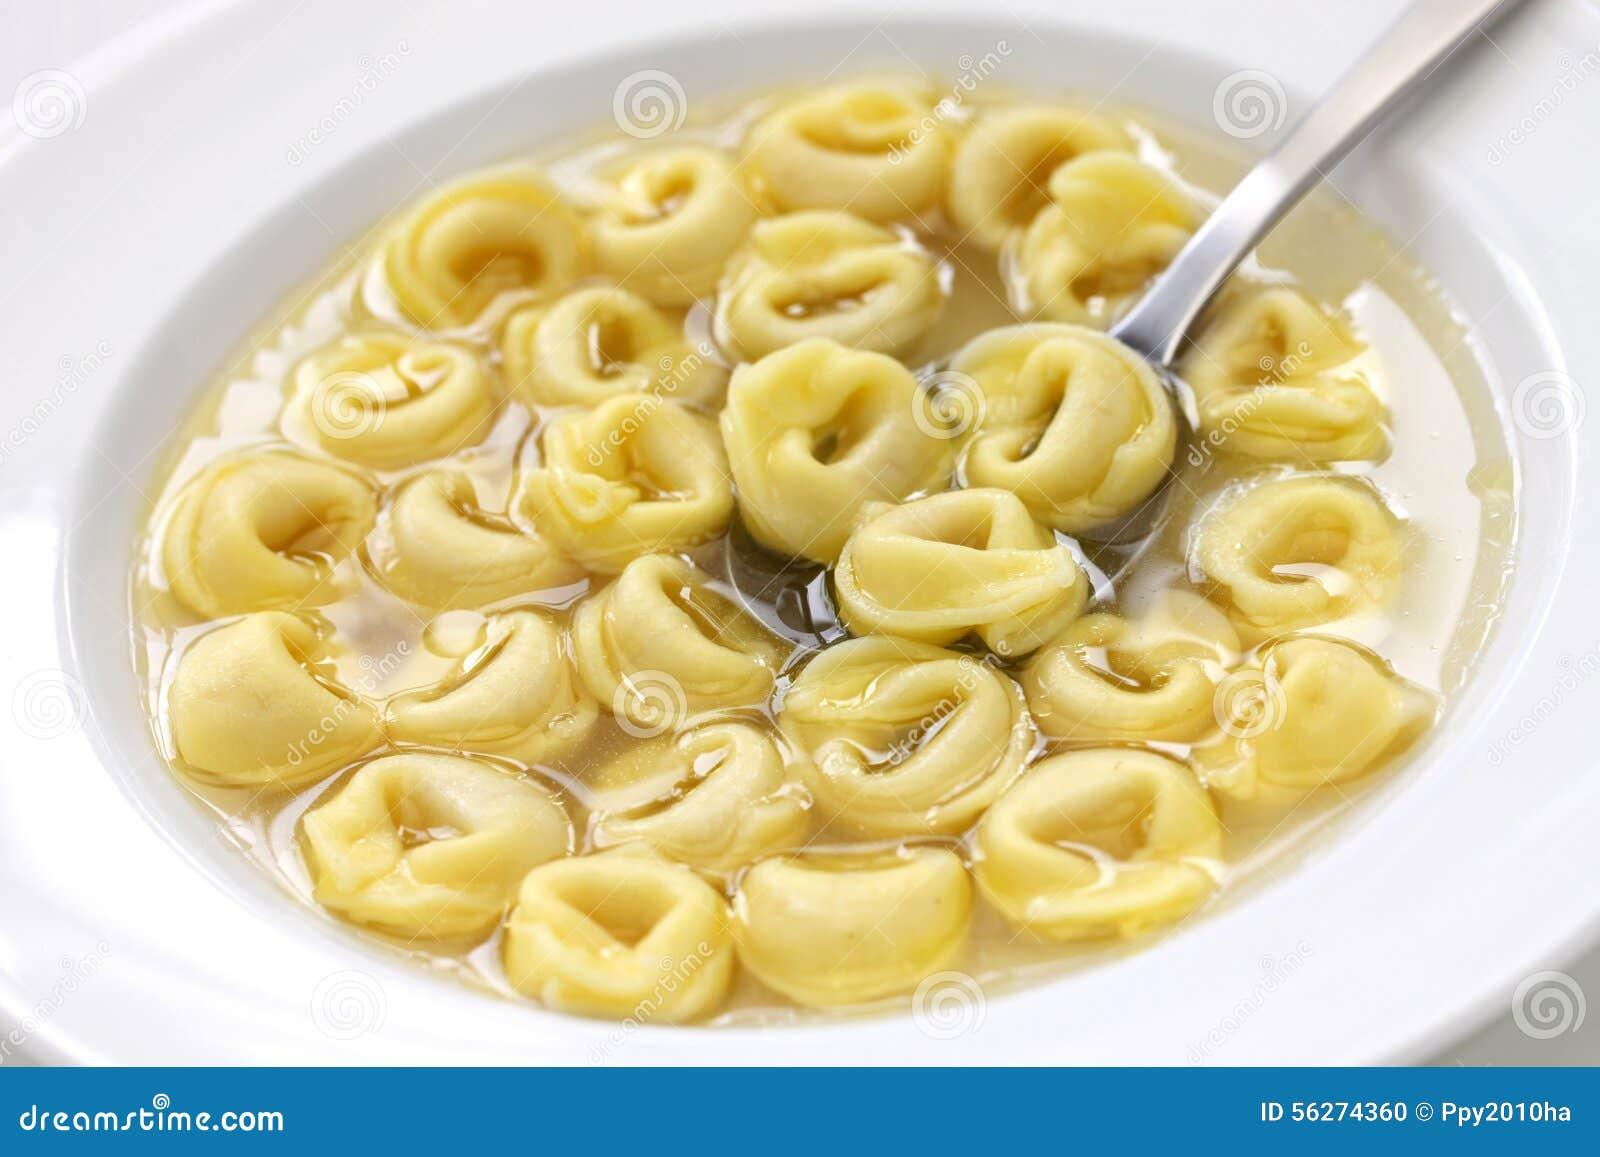 Tortellini dans le brodo cuisine italienne photo stock for Cuisine italienne